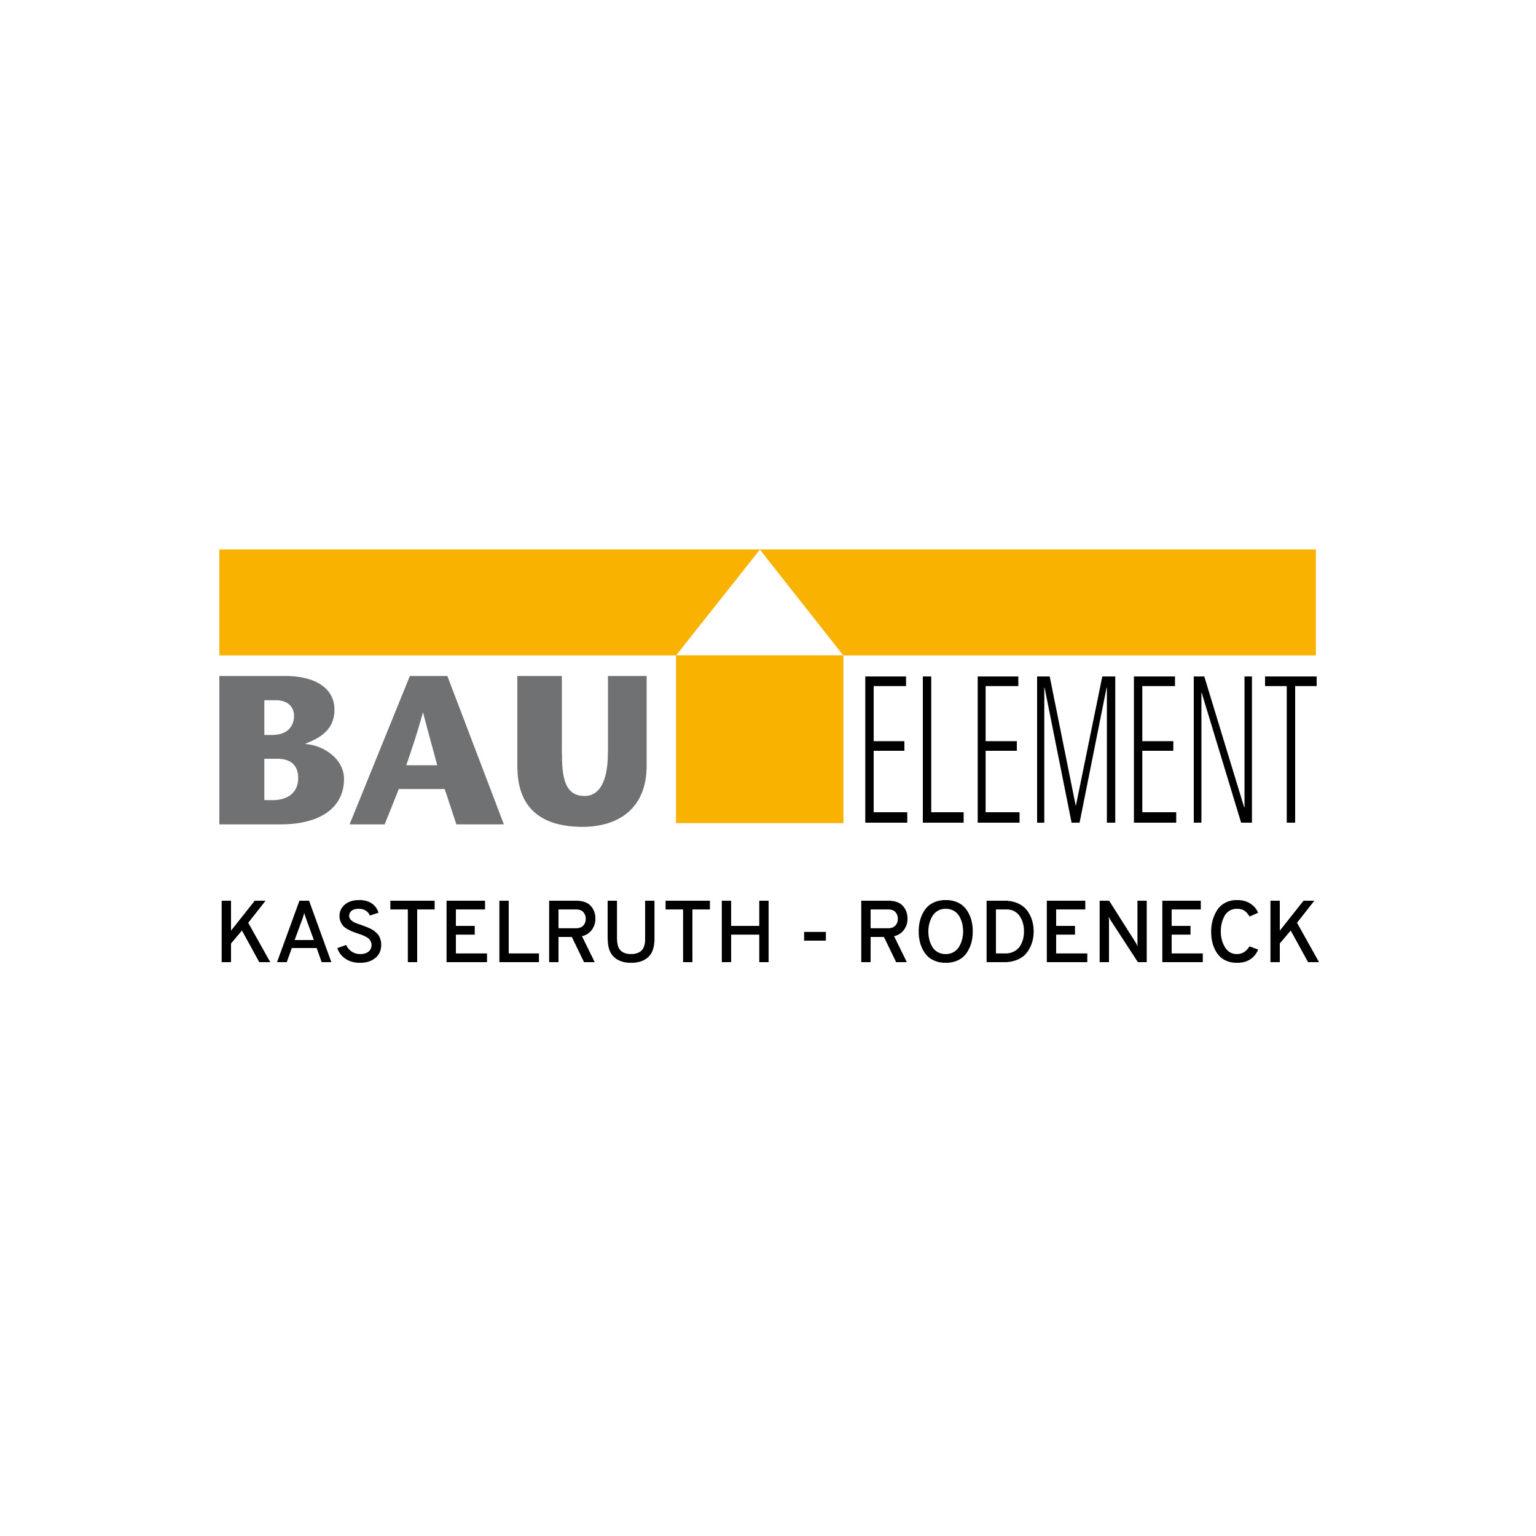 bauelement logo